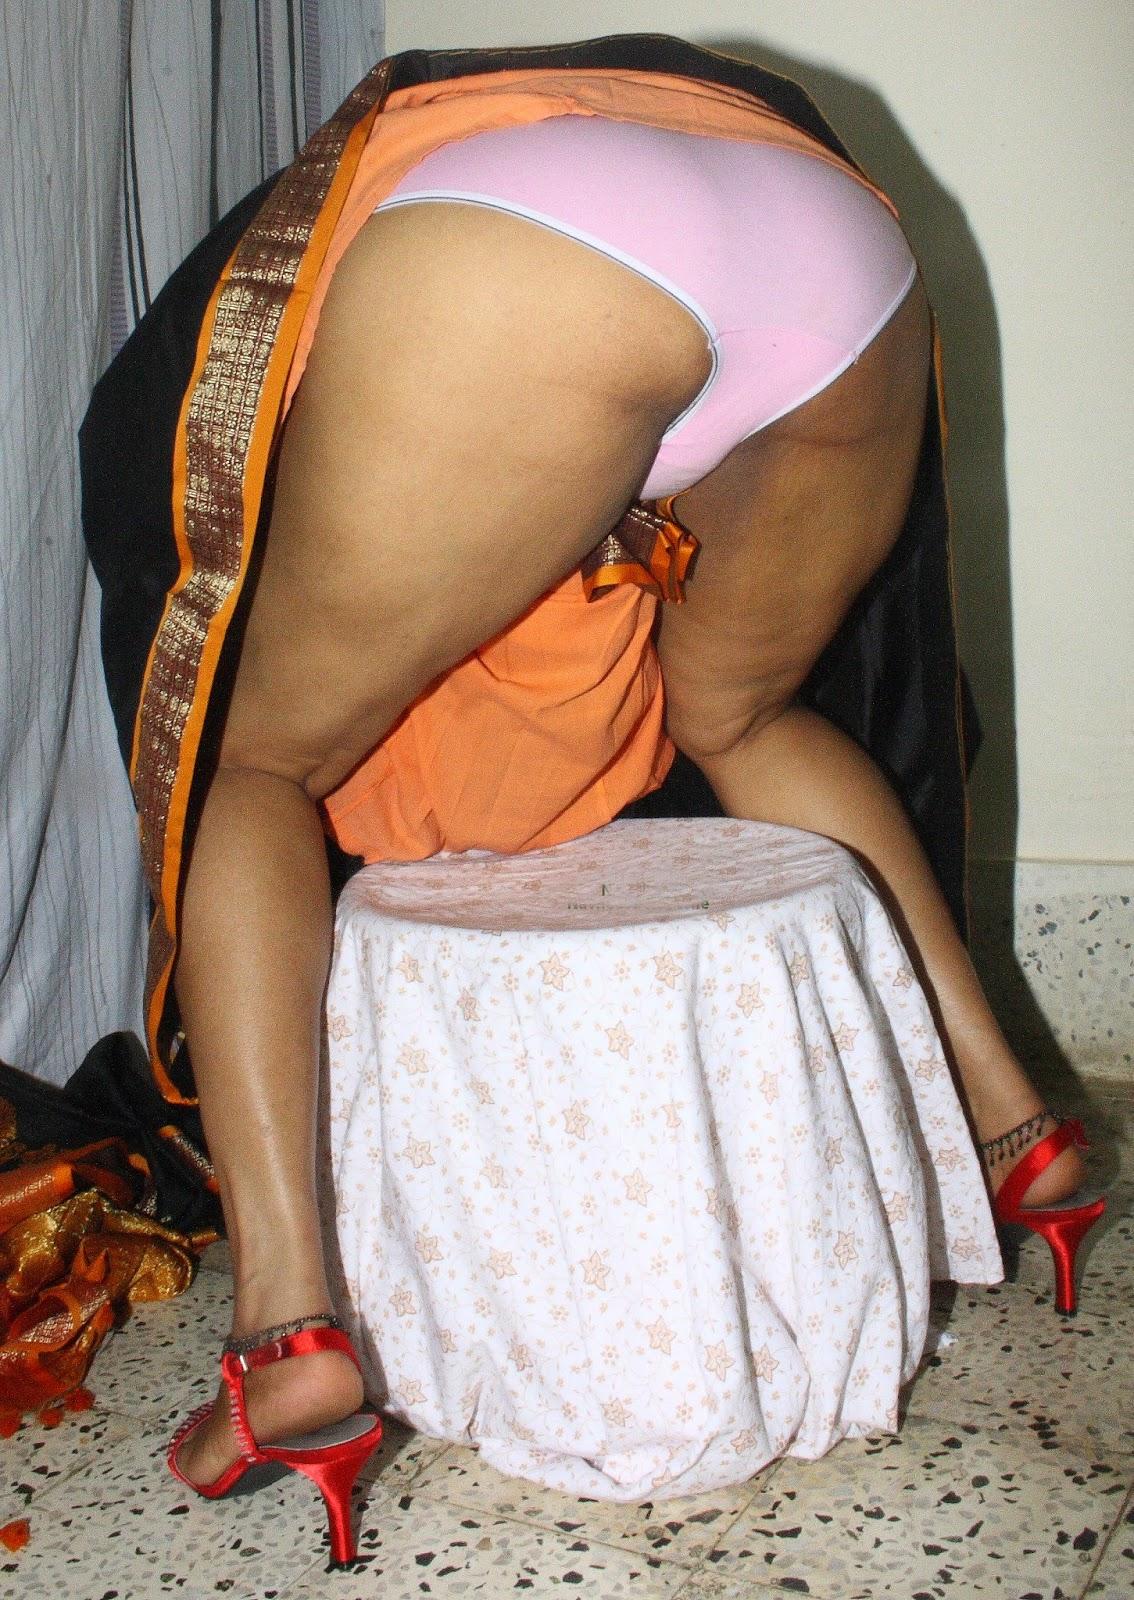 Indian girl upskirt pussy congratulate, what